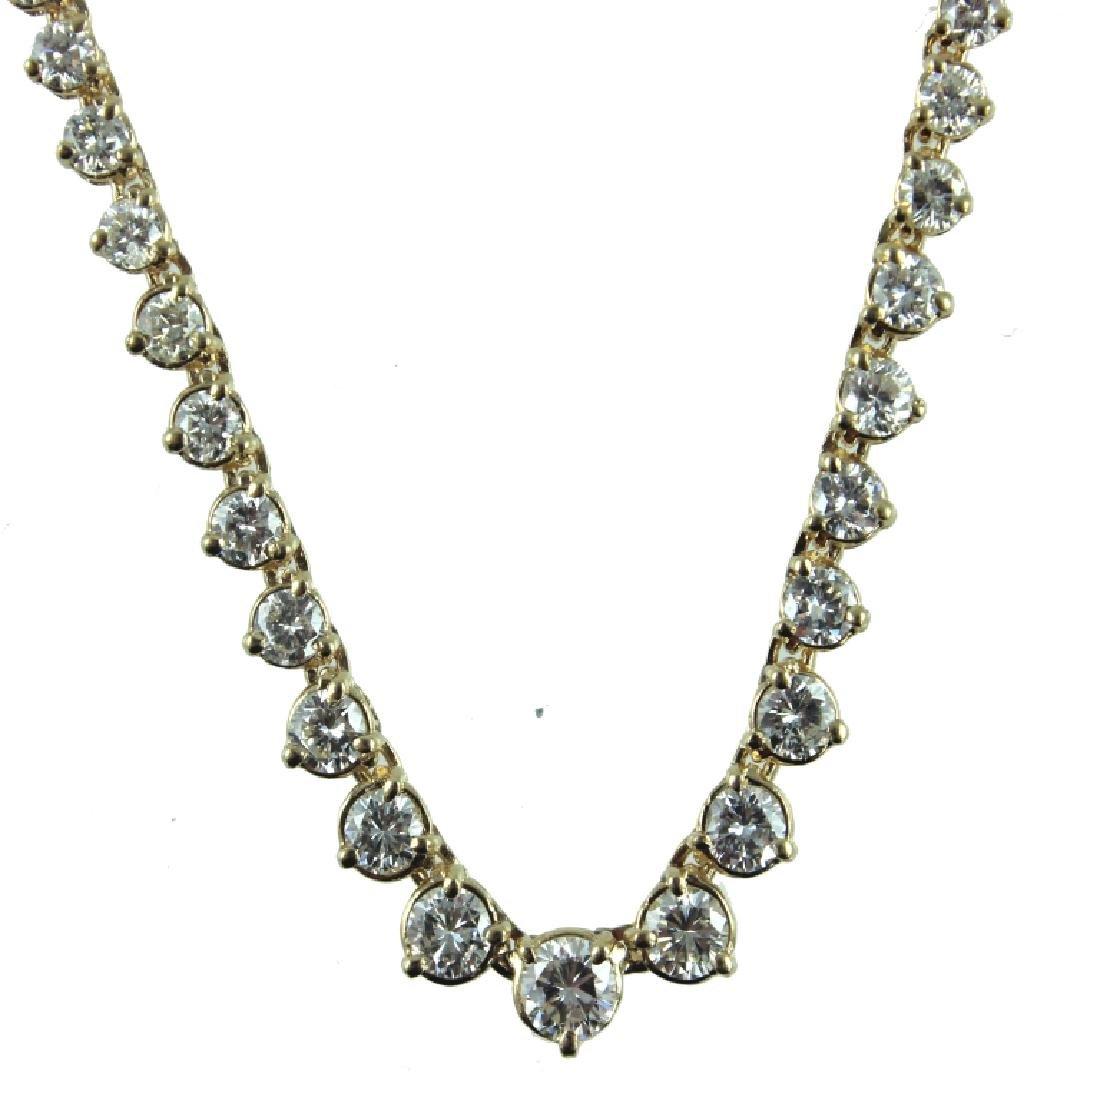 14K 12.00 CARAT DIAMOND TENNIS NECKLACE